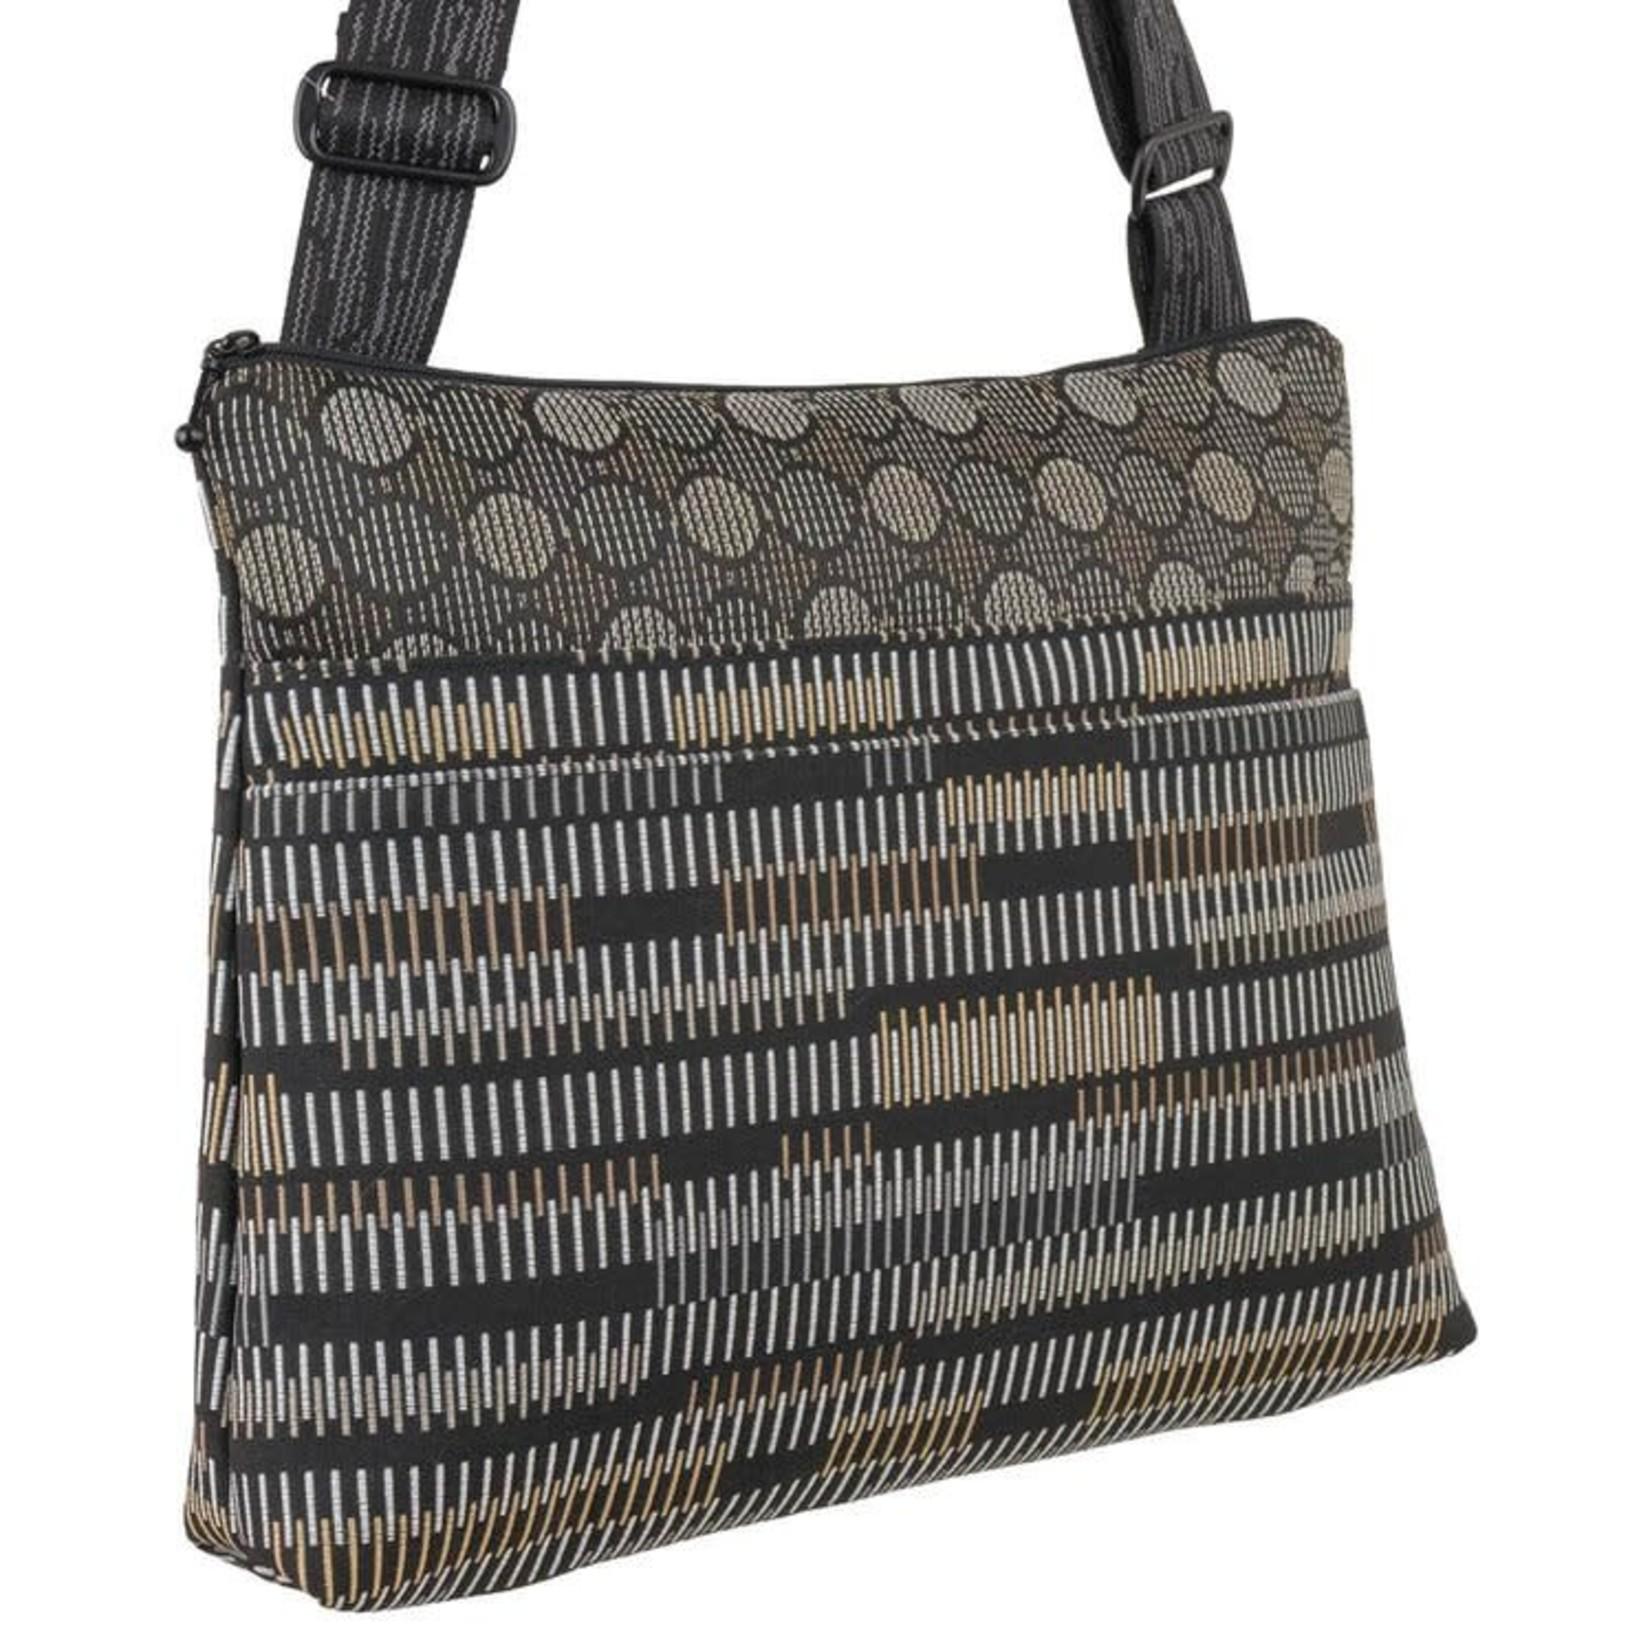 Maruca Design Maruca Poet Bag in